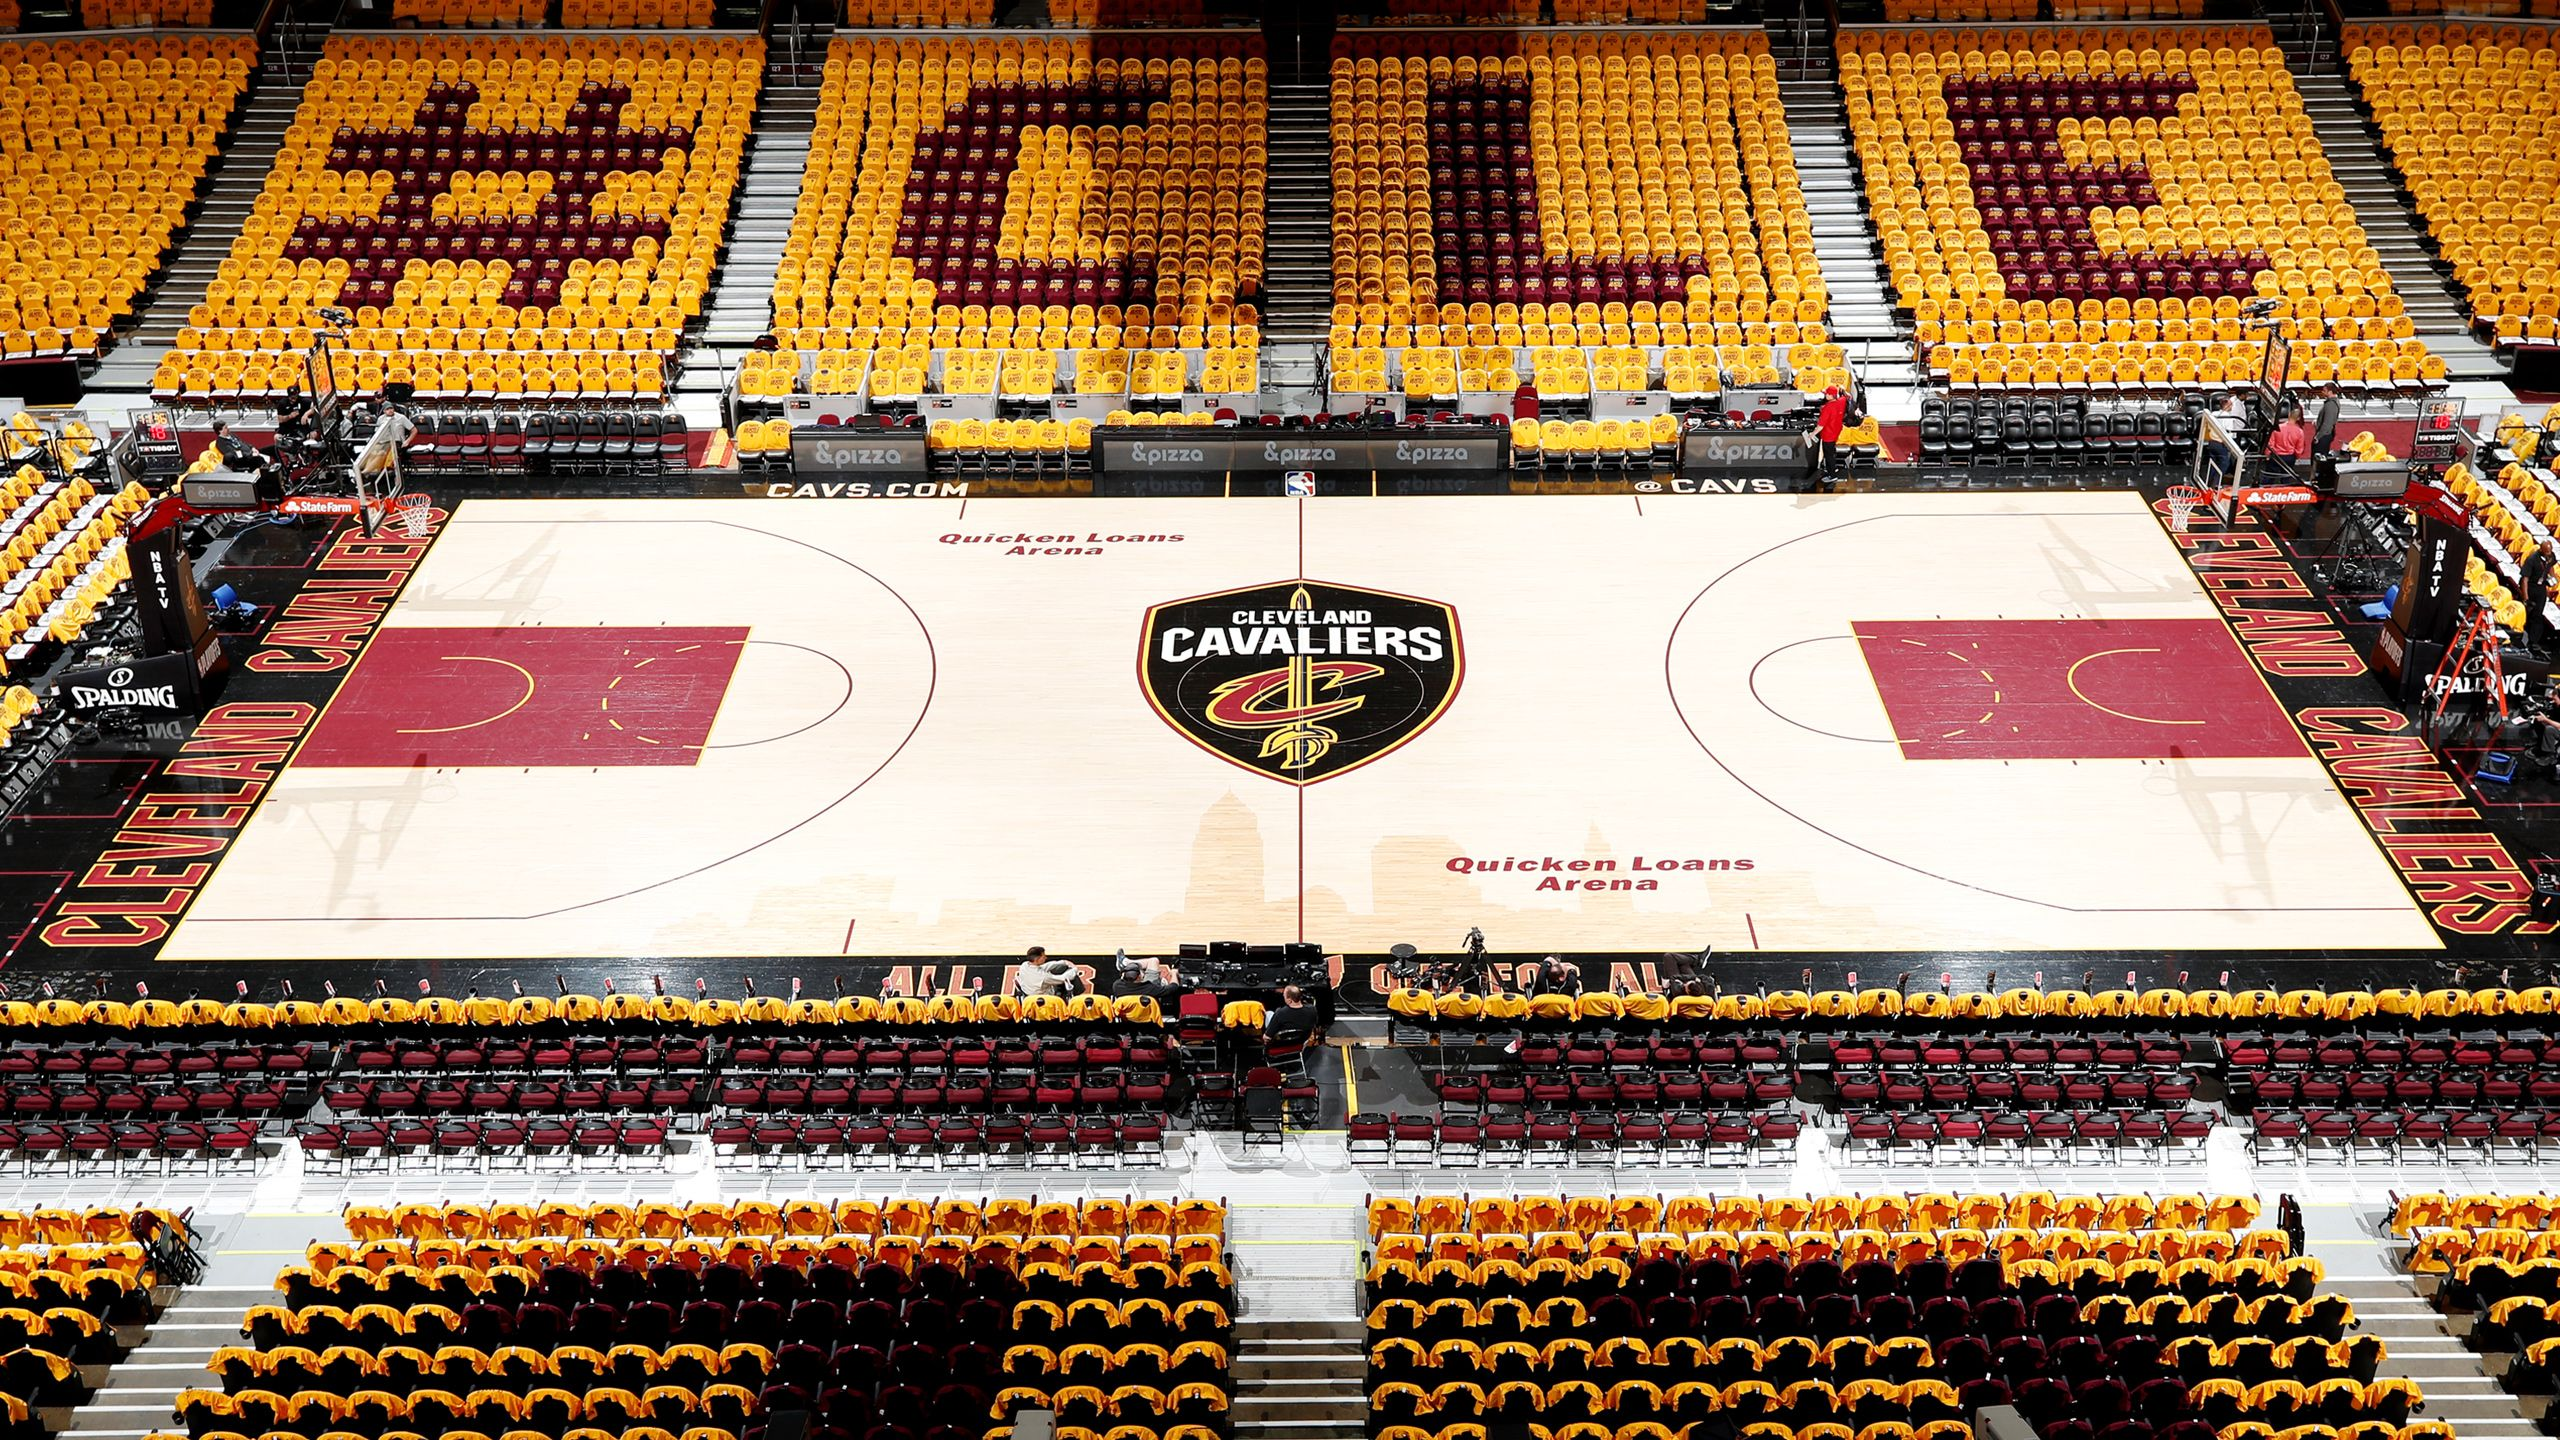 Above The Rim - Boston Celtics vs. Cleveland Cavaliers (Conference Finals Game 4)